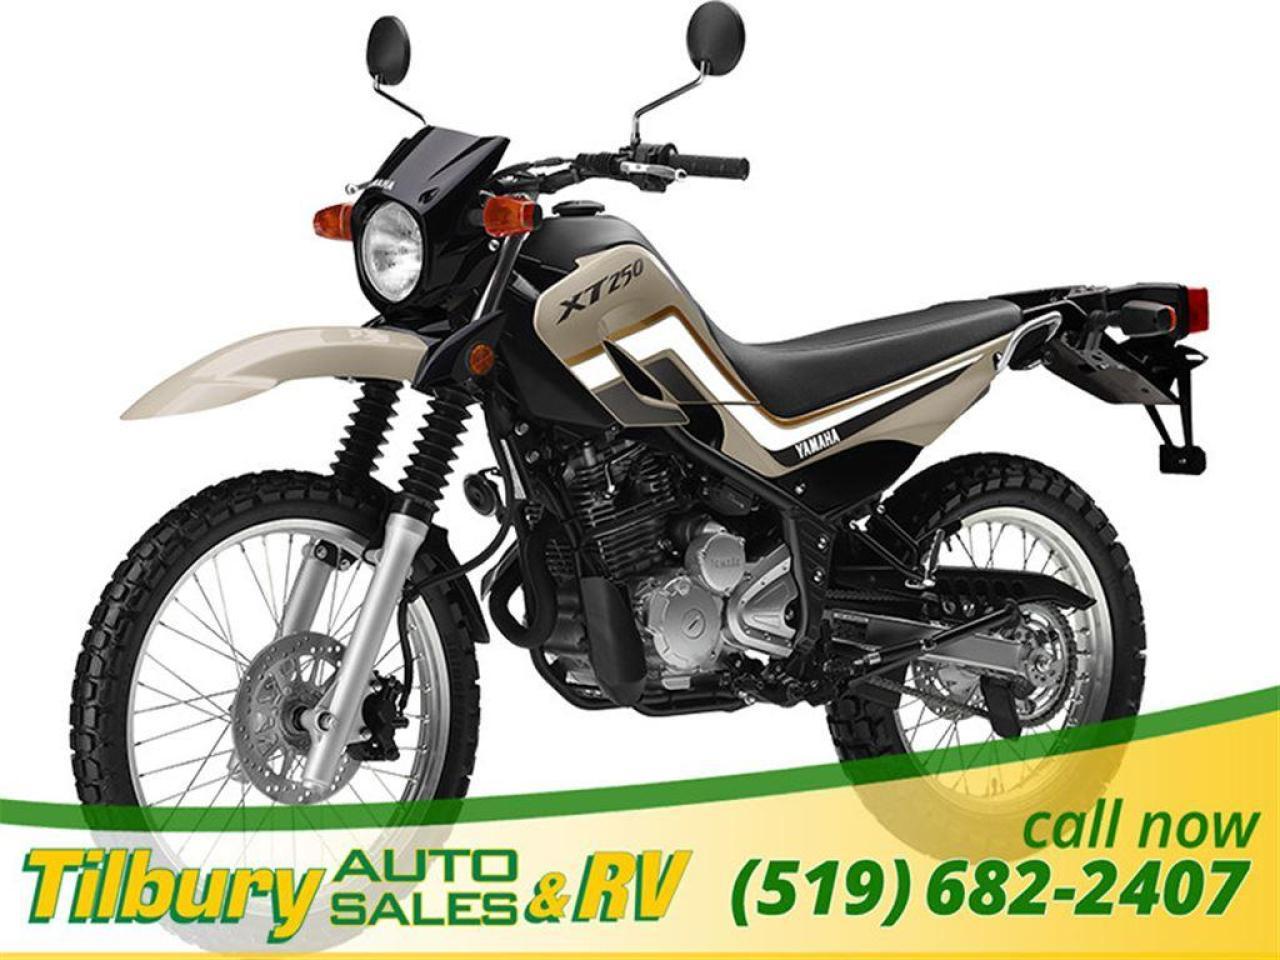 2018 Yamaha XT250 249cc, 2-valve, 4-stroke single.